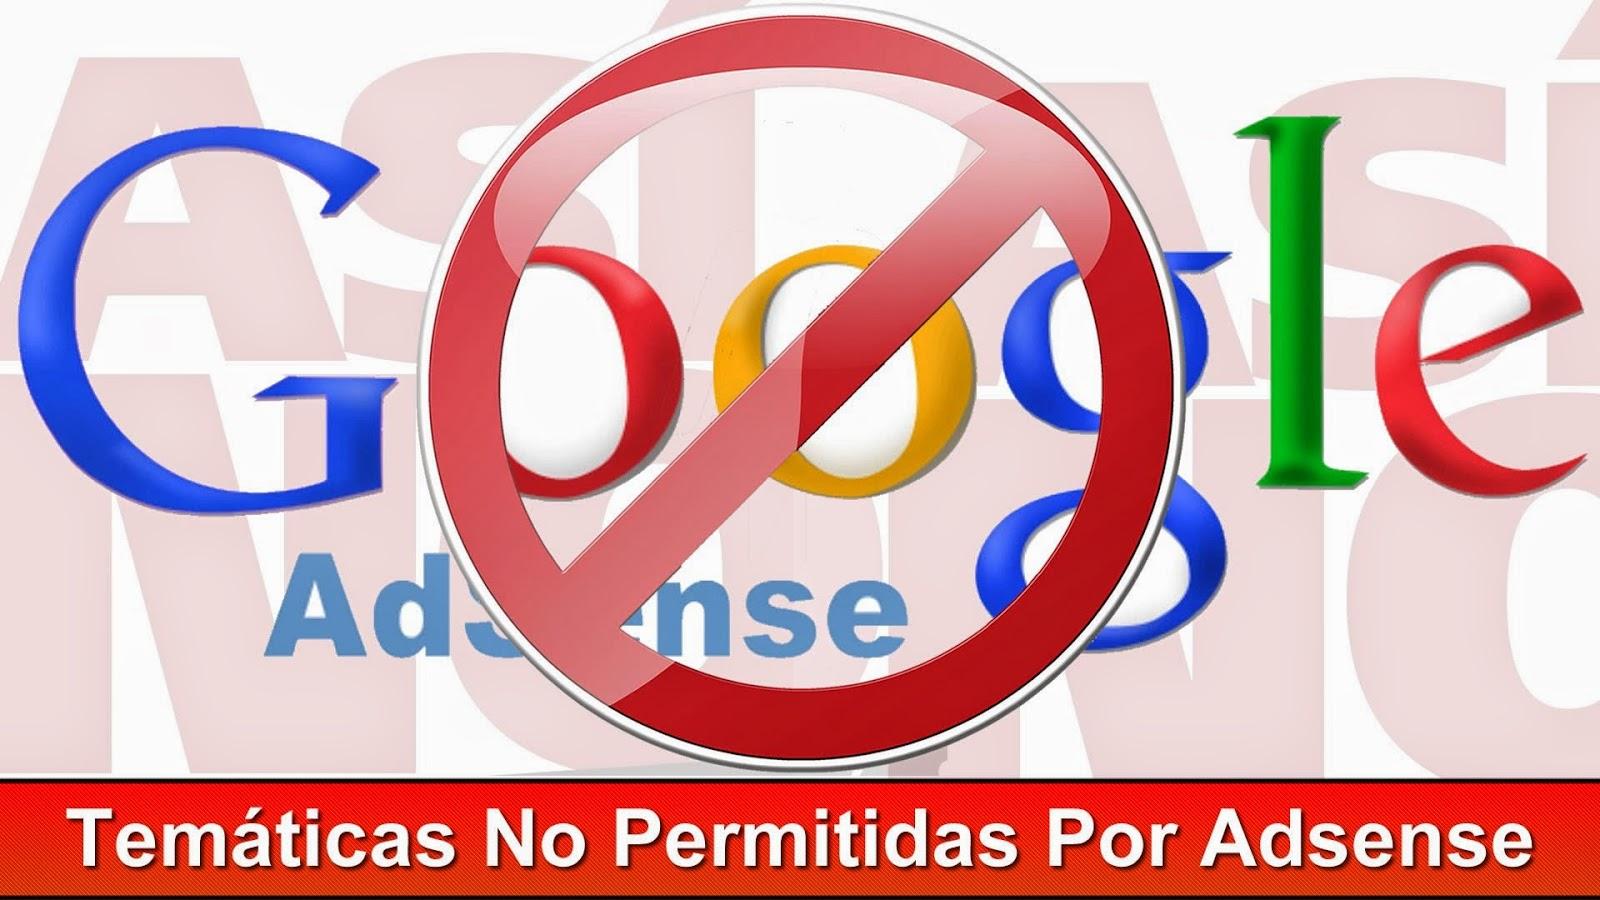 prohibido por adsense